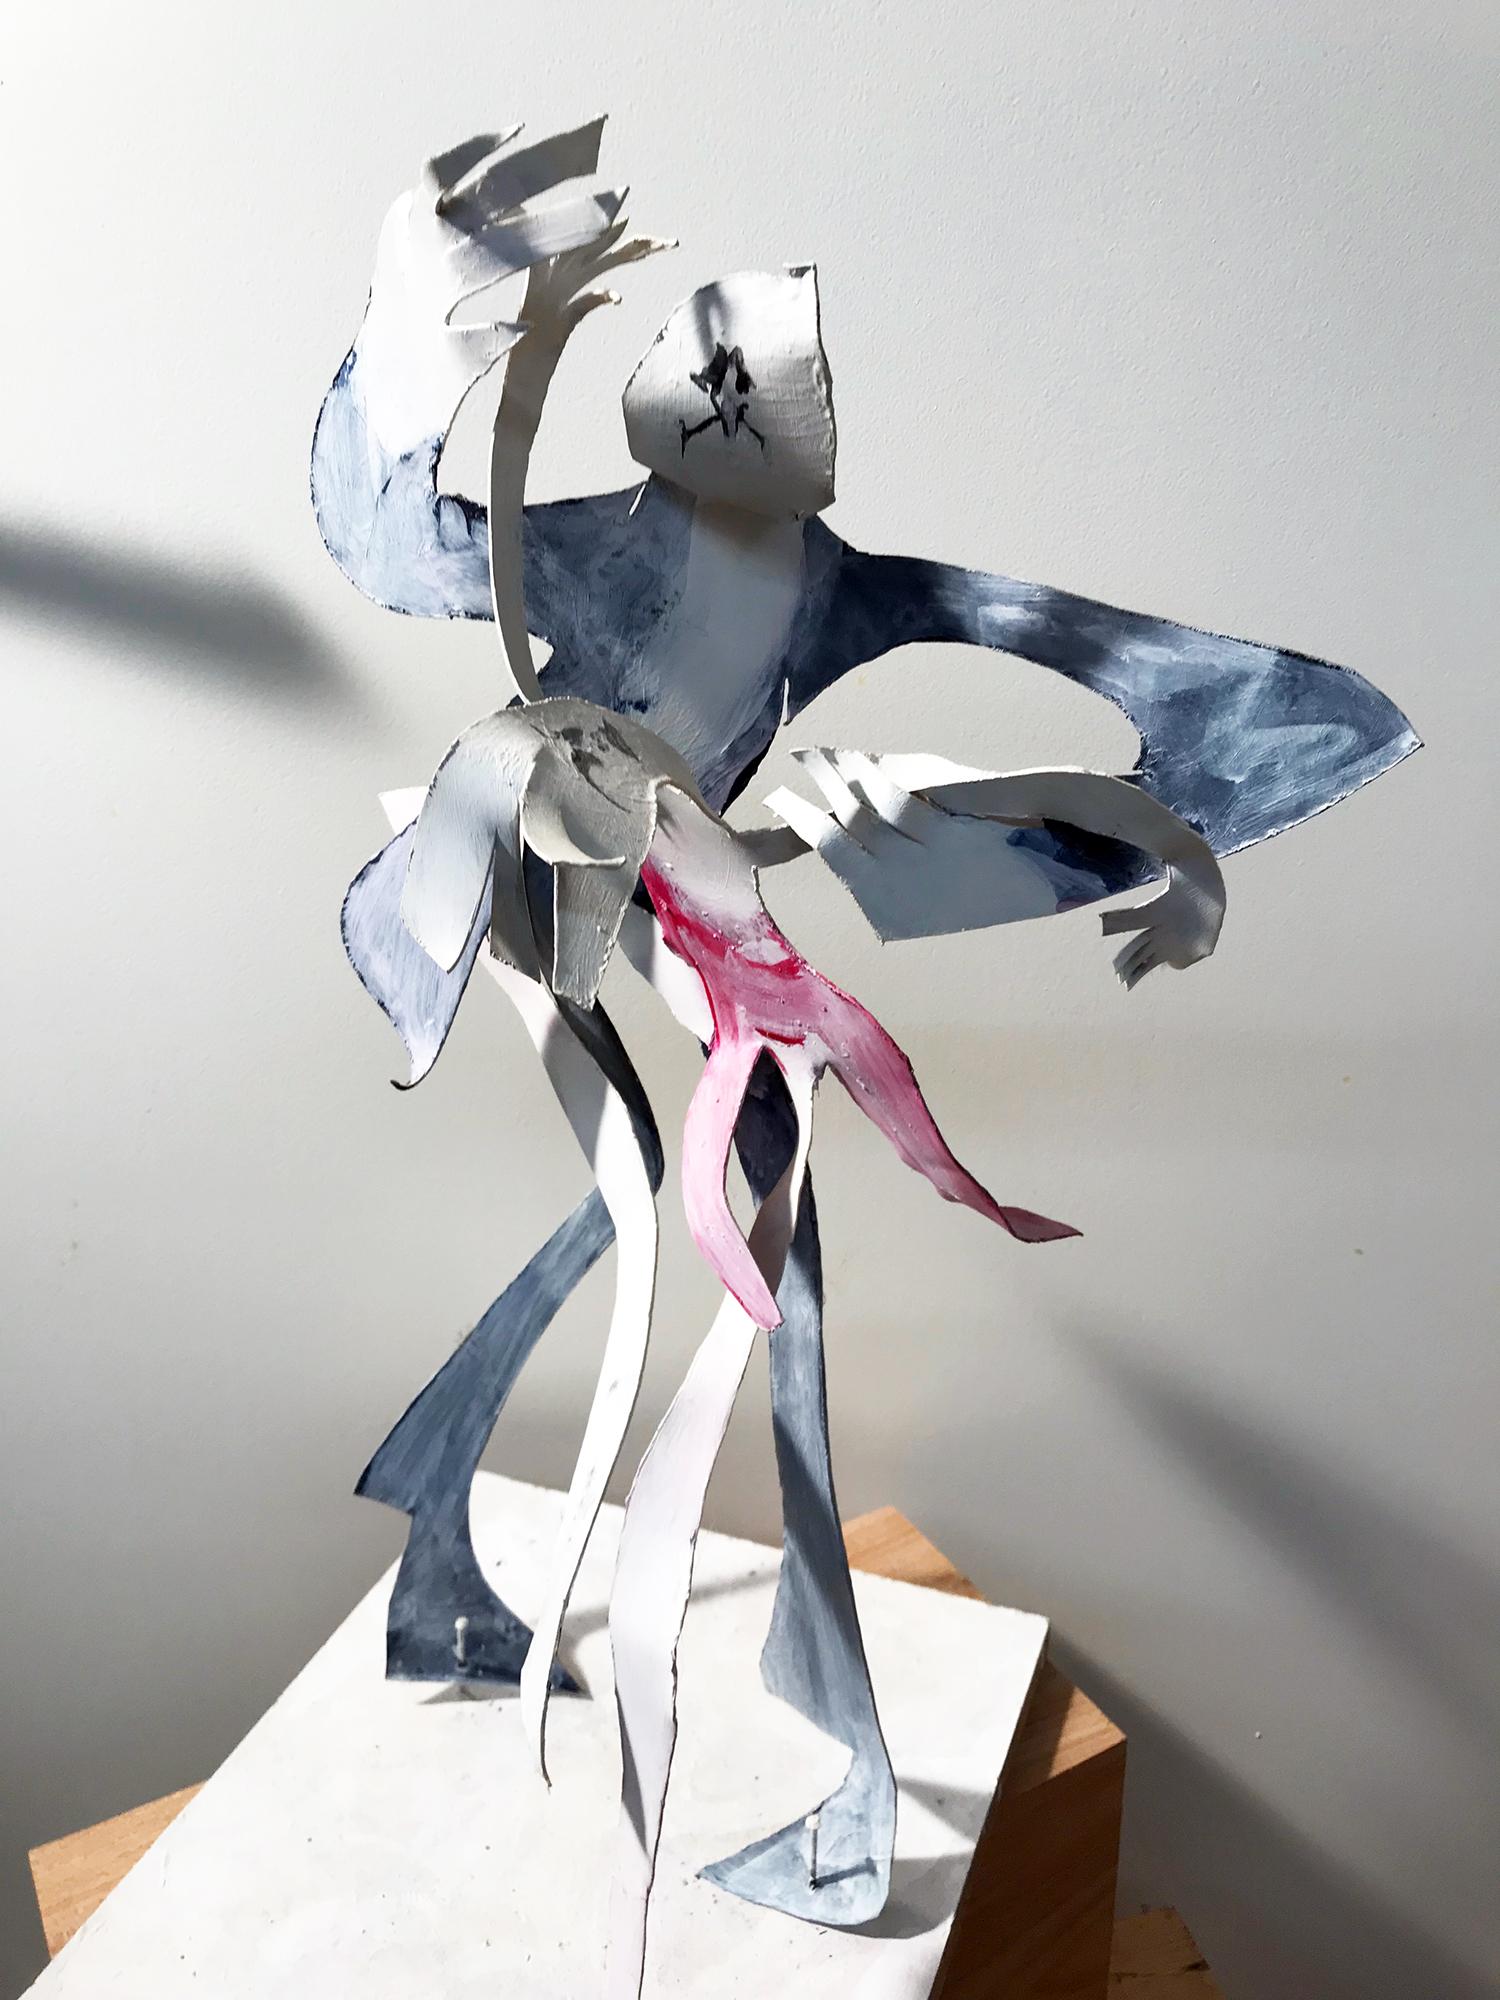 Tango, Karton auf Holz, Acryl, ca. 25 x 25 x 45 cm